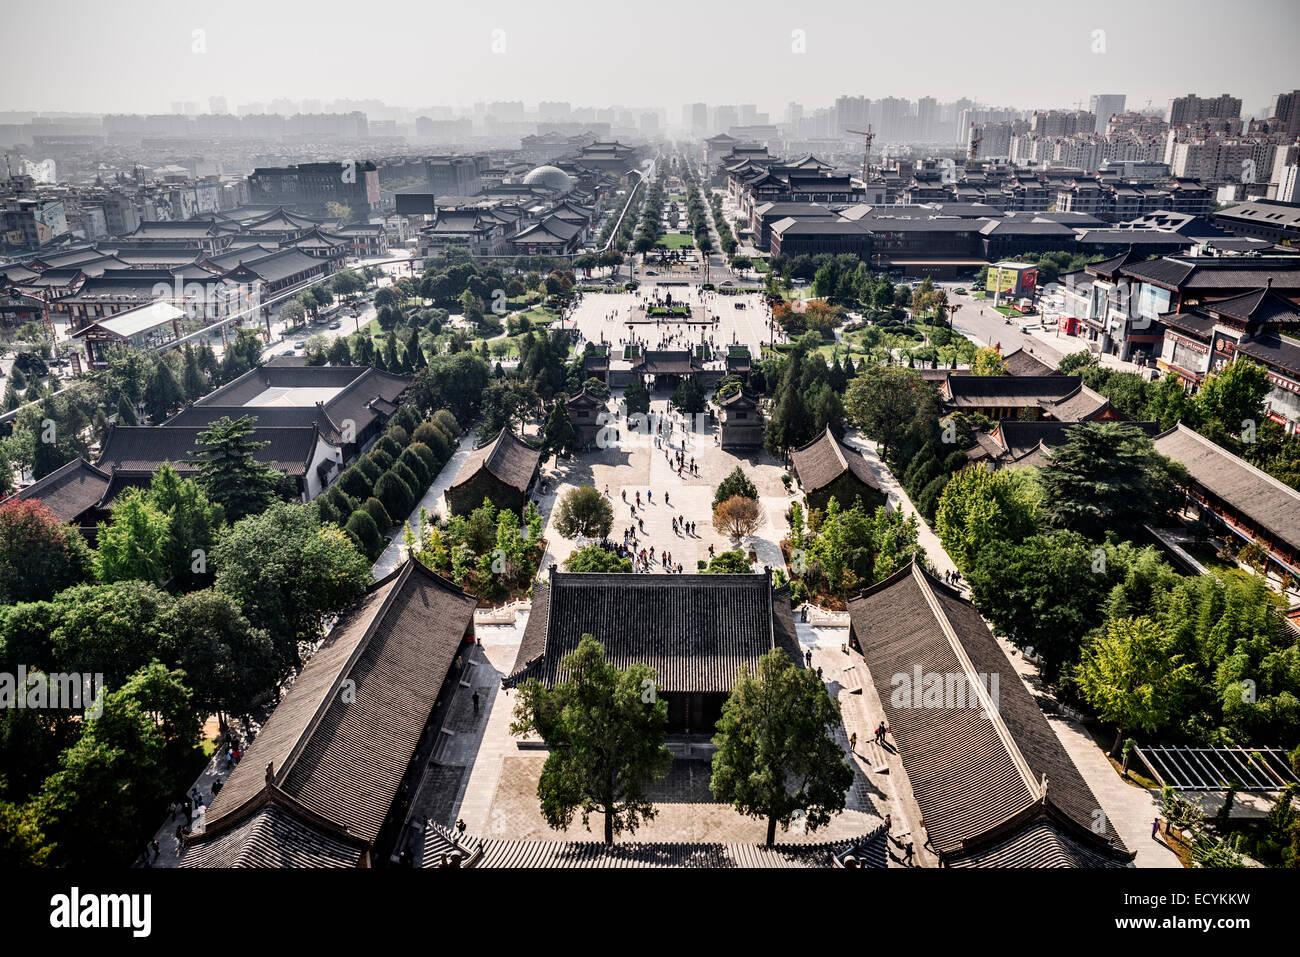 Xi'an ciudad antena gigante de ver la Pagoda del Ganso Salvaje. Xi'an, Shaanxi, China 2014 Imagen De Stock